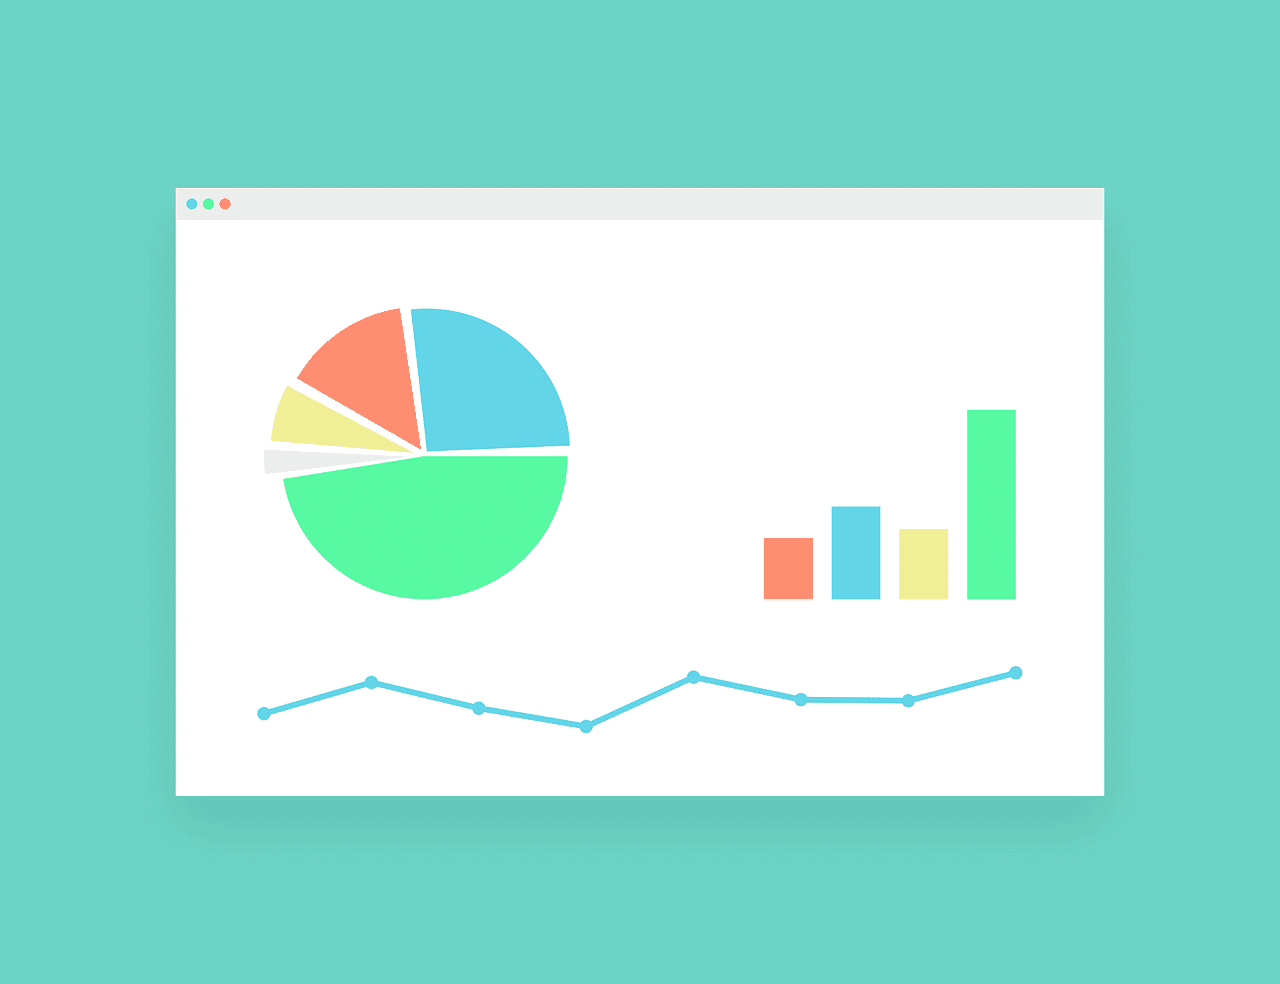 【Excel】数値の「0埋め」(前ゼロ)を表示する方法を簡単に解説!